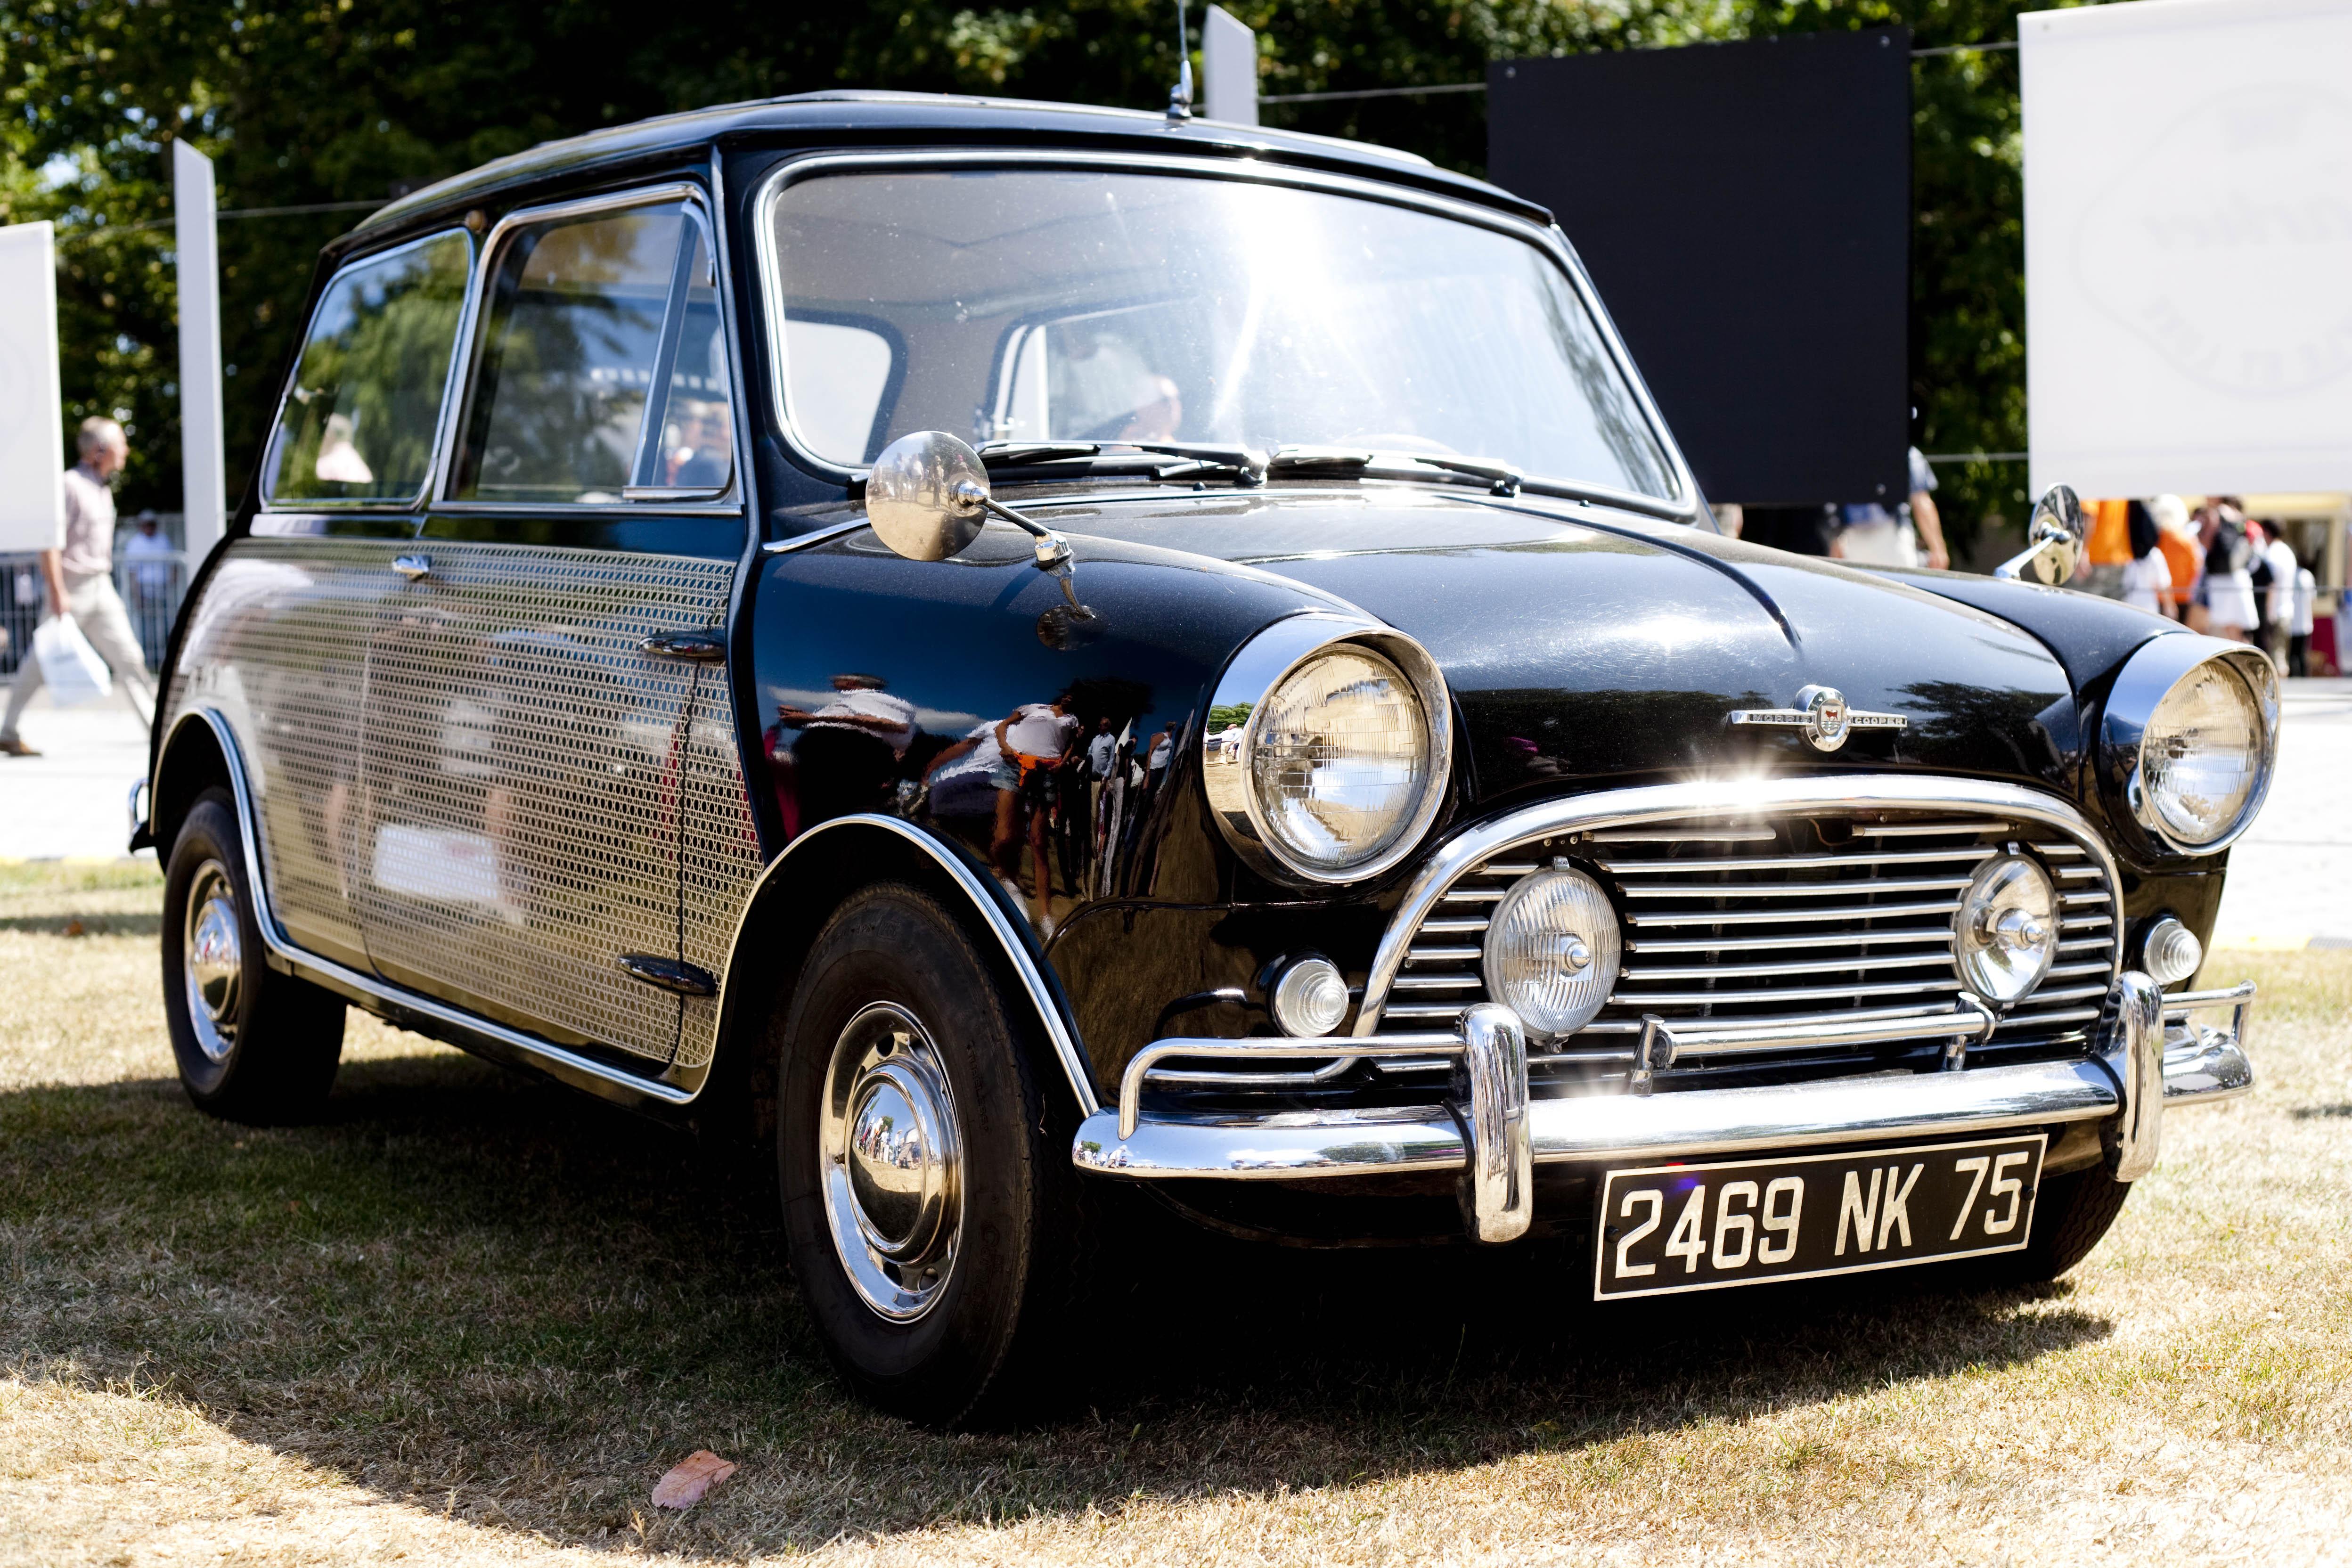 Peter Sellars's mini exemplified sixties automotive style.